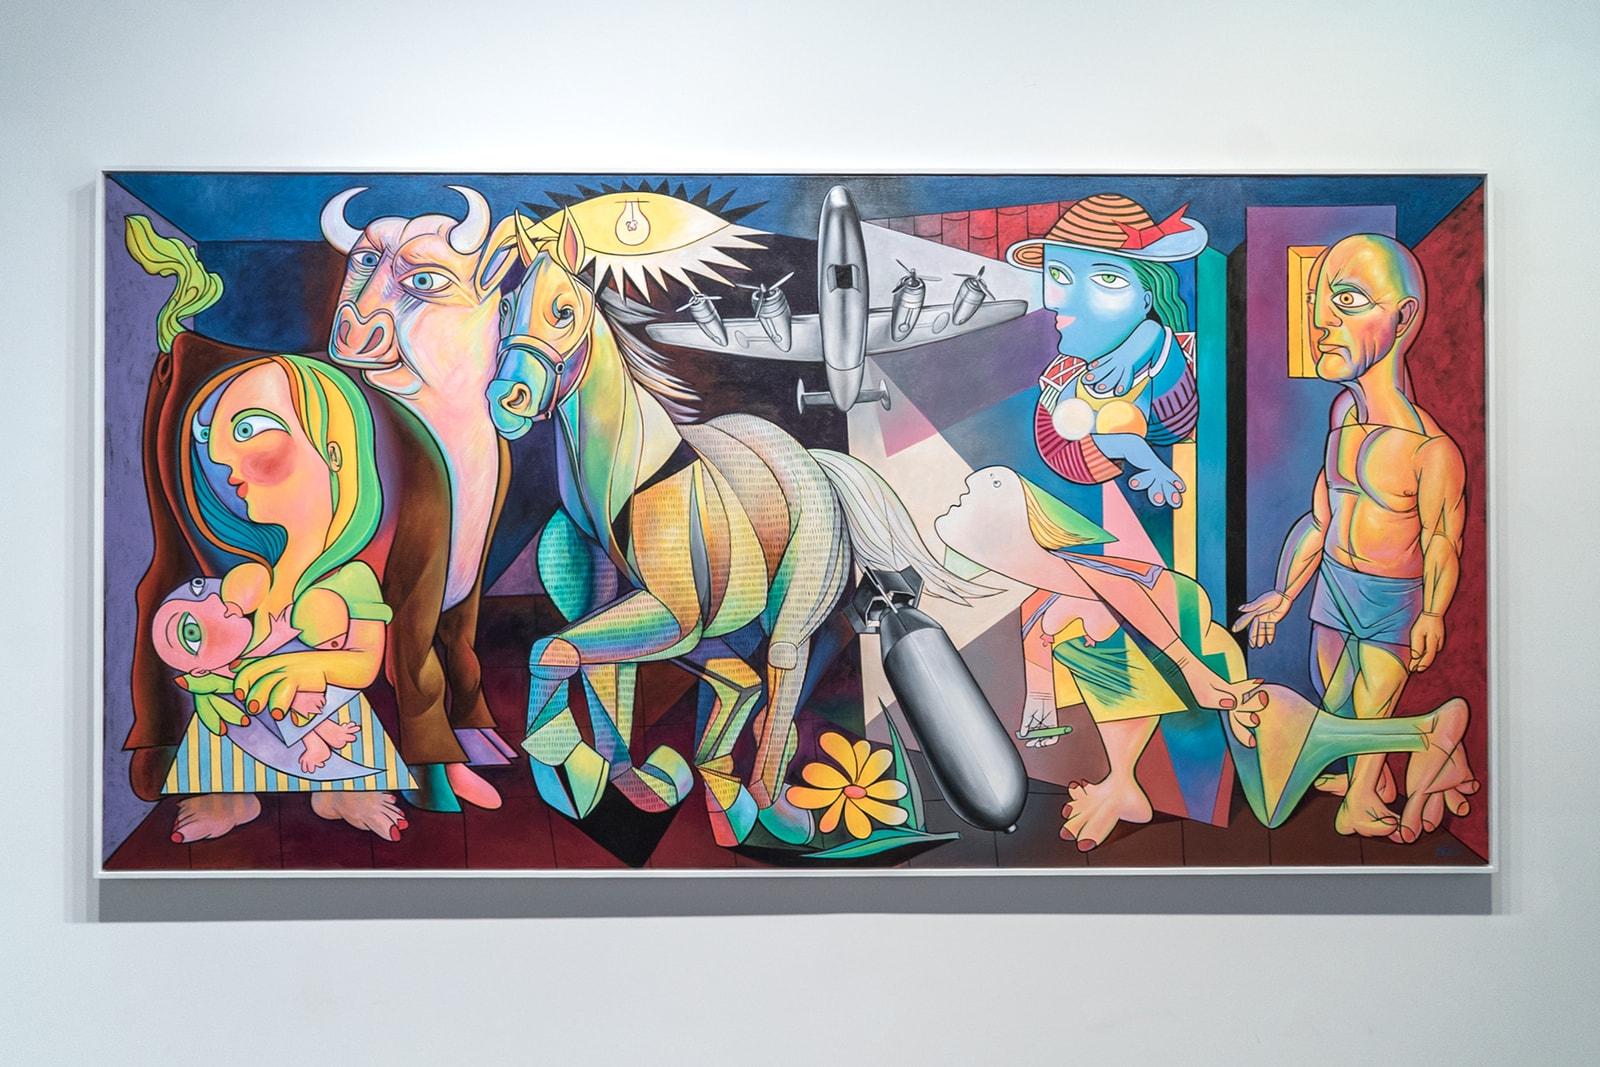 Ron English Pablo Picasso 'Guernica'